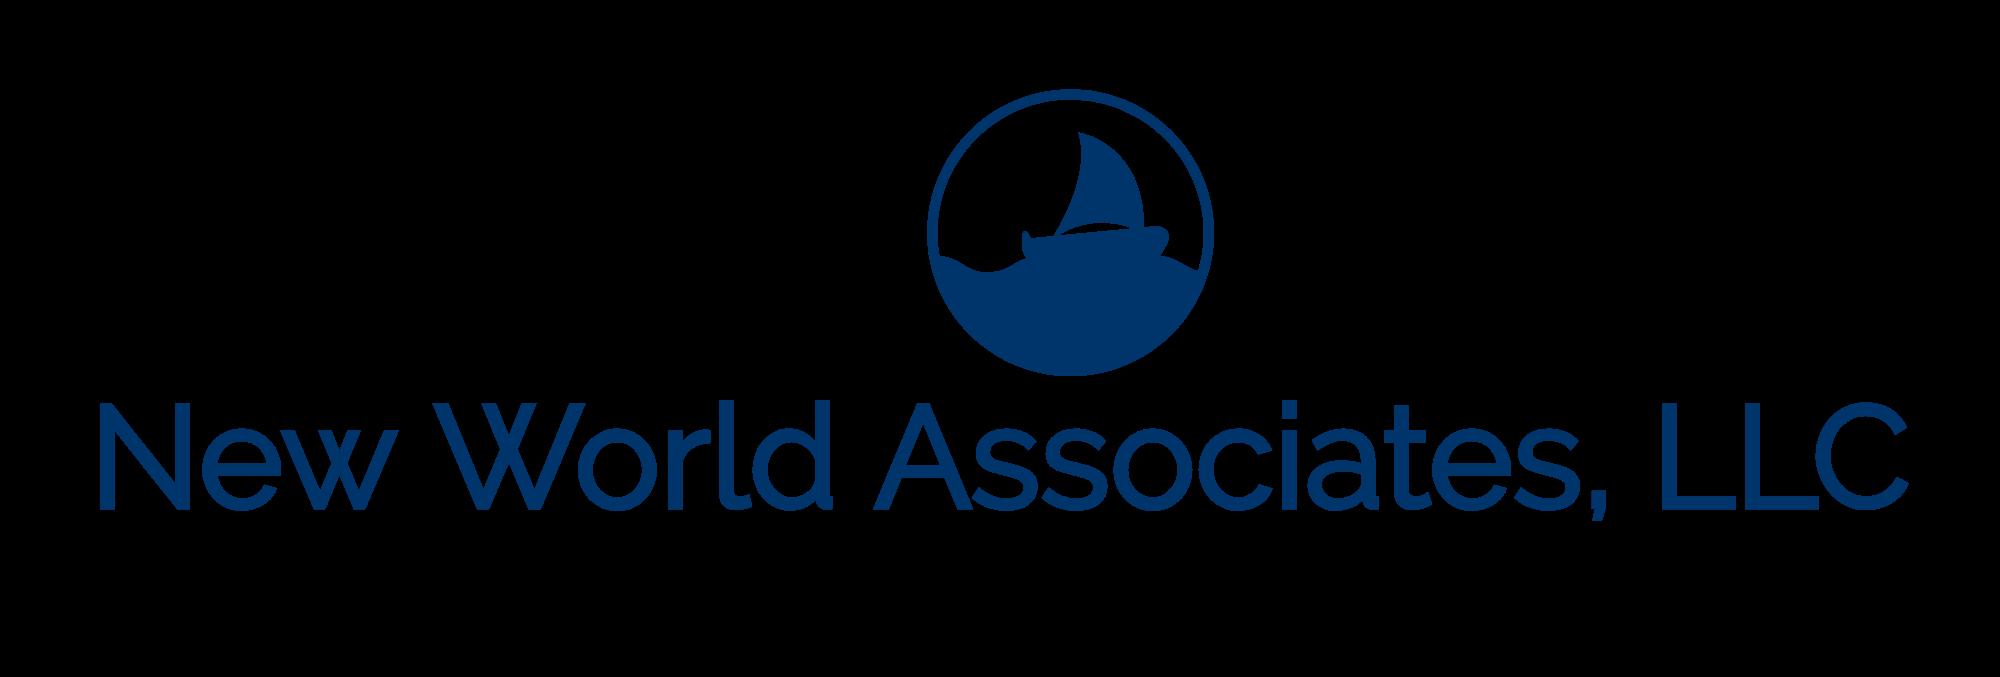 New World Associates, LLC-logo.png